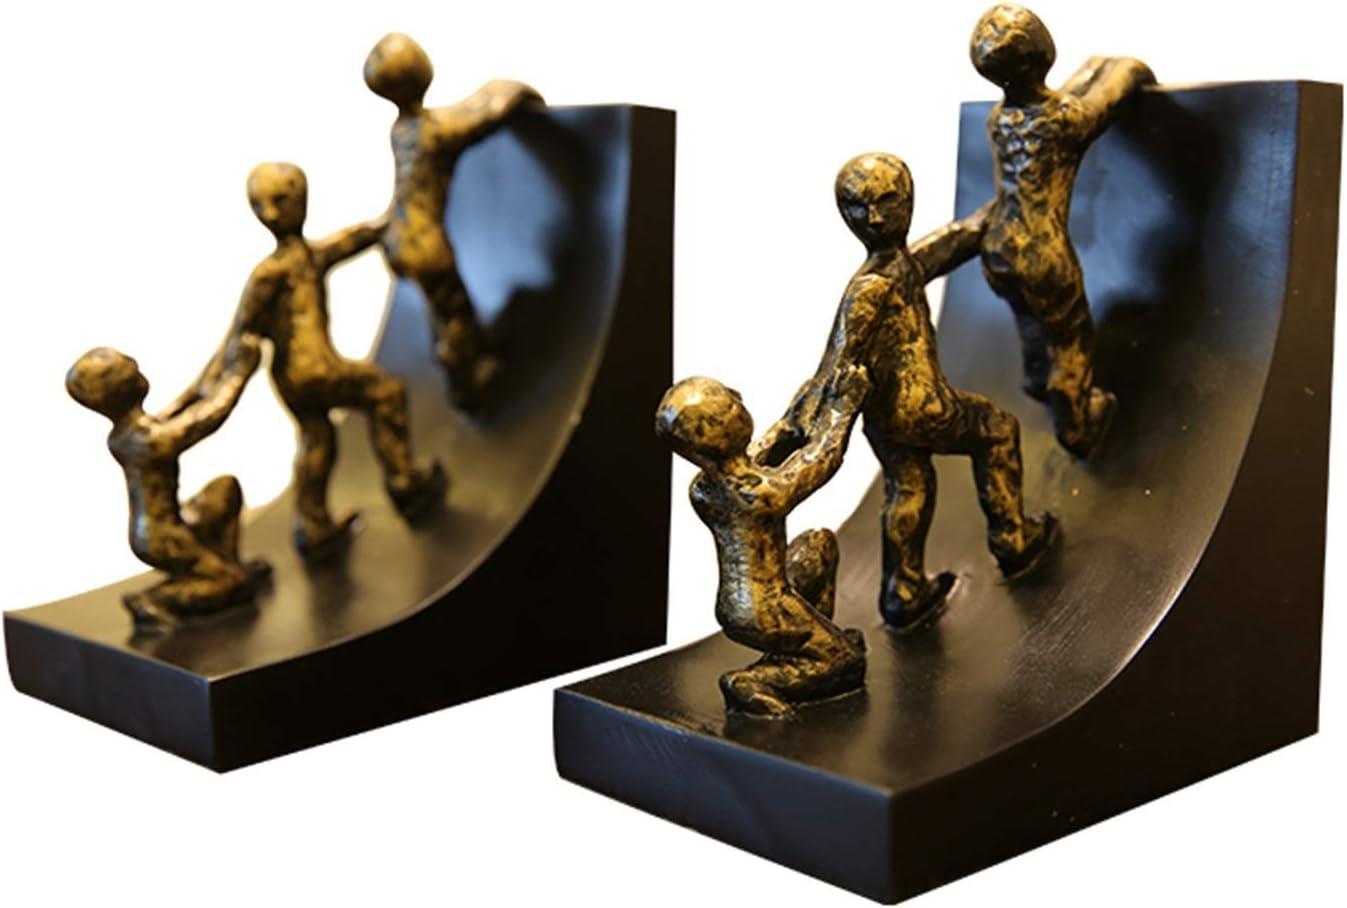 ZLQBHJ Latest item Book Shelf Bookcase shipfree Study Creative Boo Bookends Ornaments